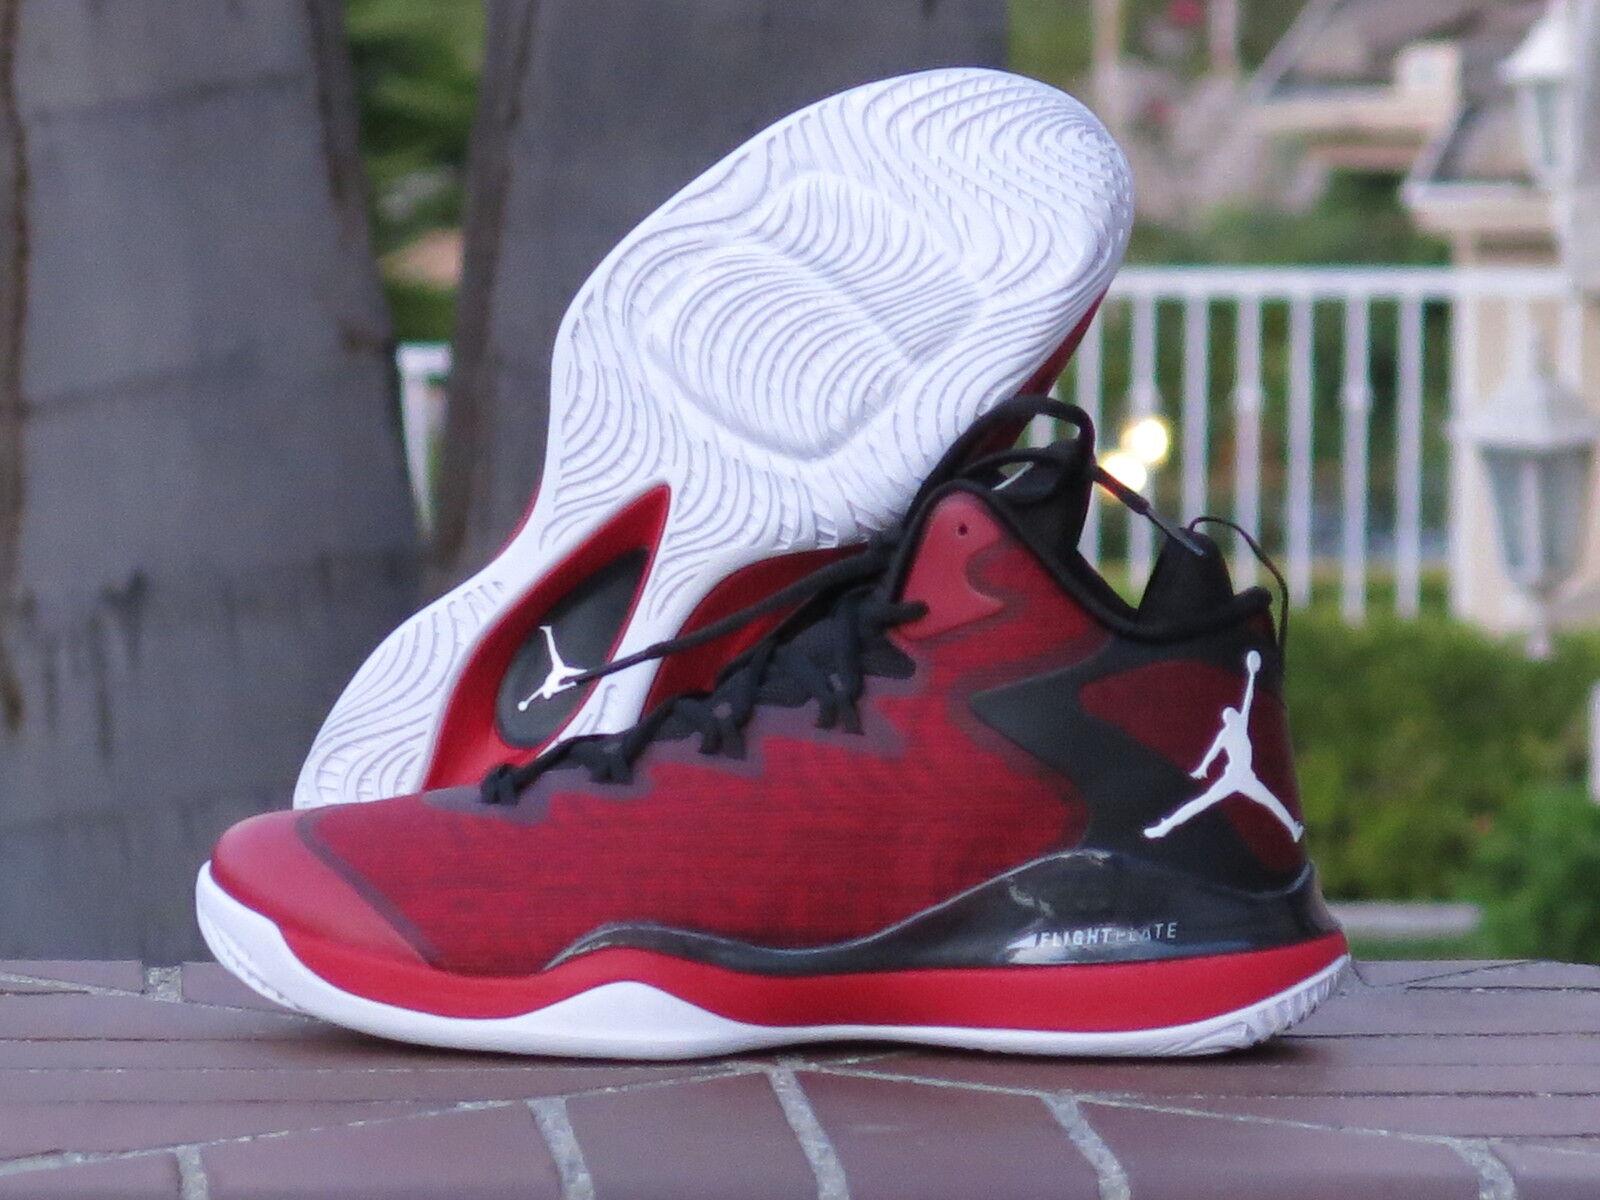 2014 Nike Air Jordan flight Plate  3 Men's Basketball Shoes 684933-613 Price reduction Wild casual shoes